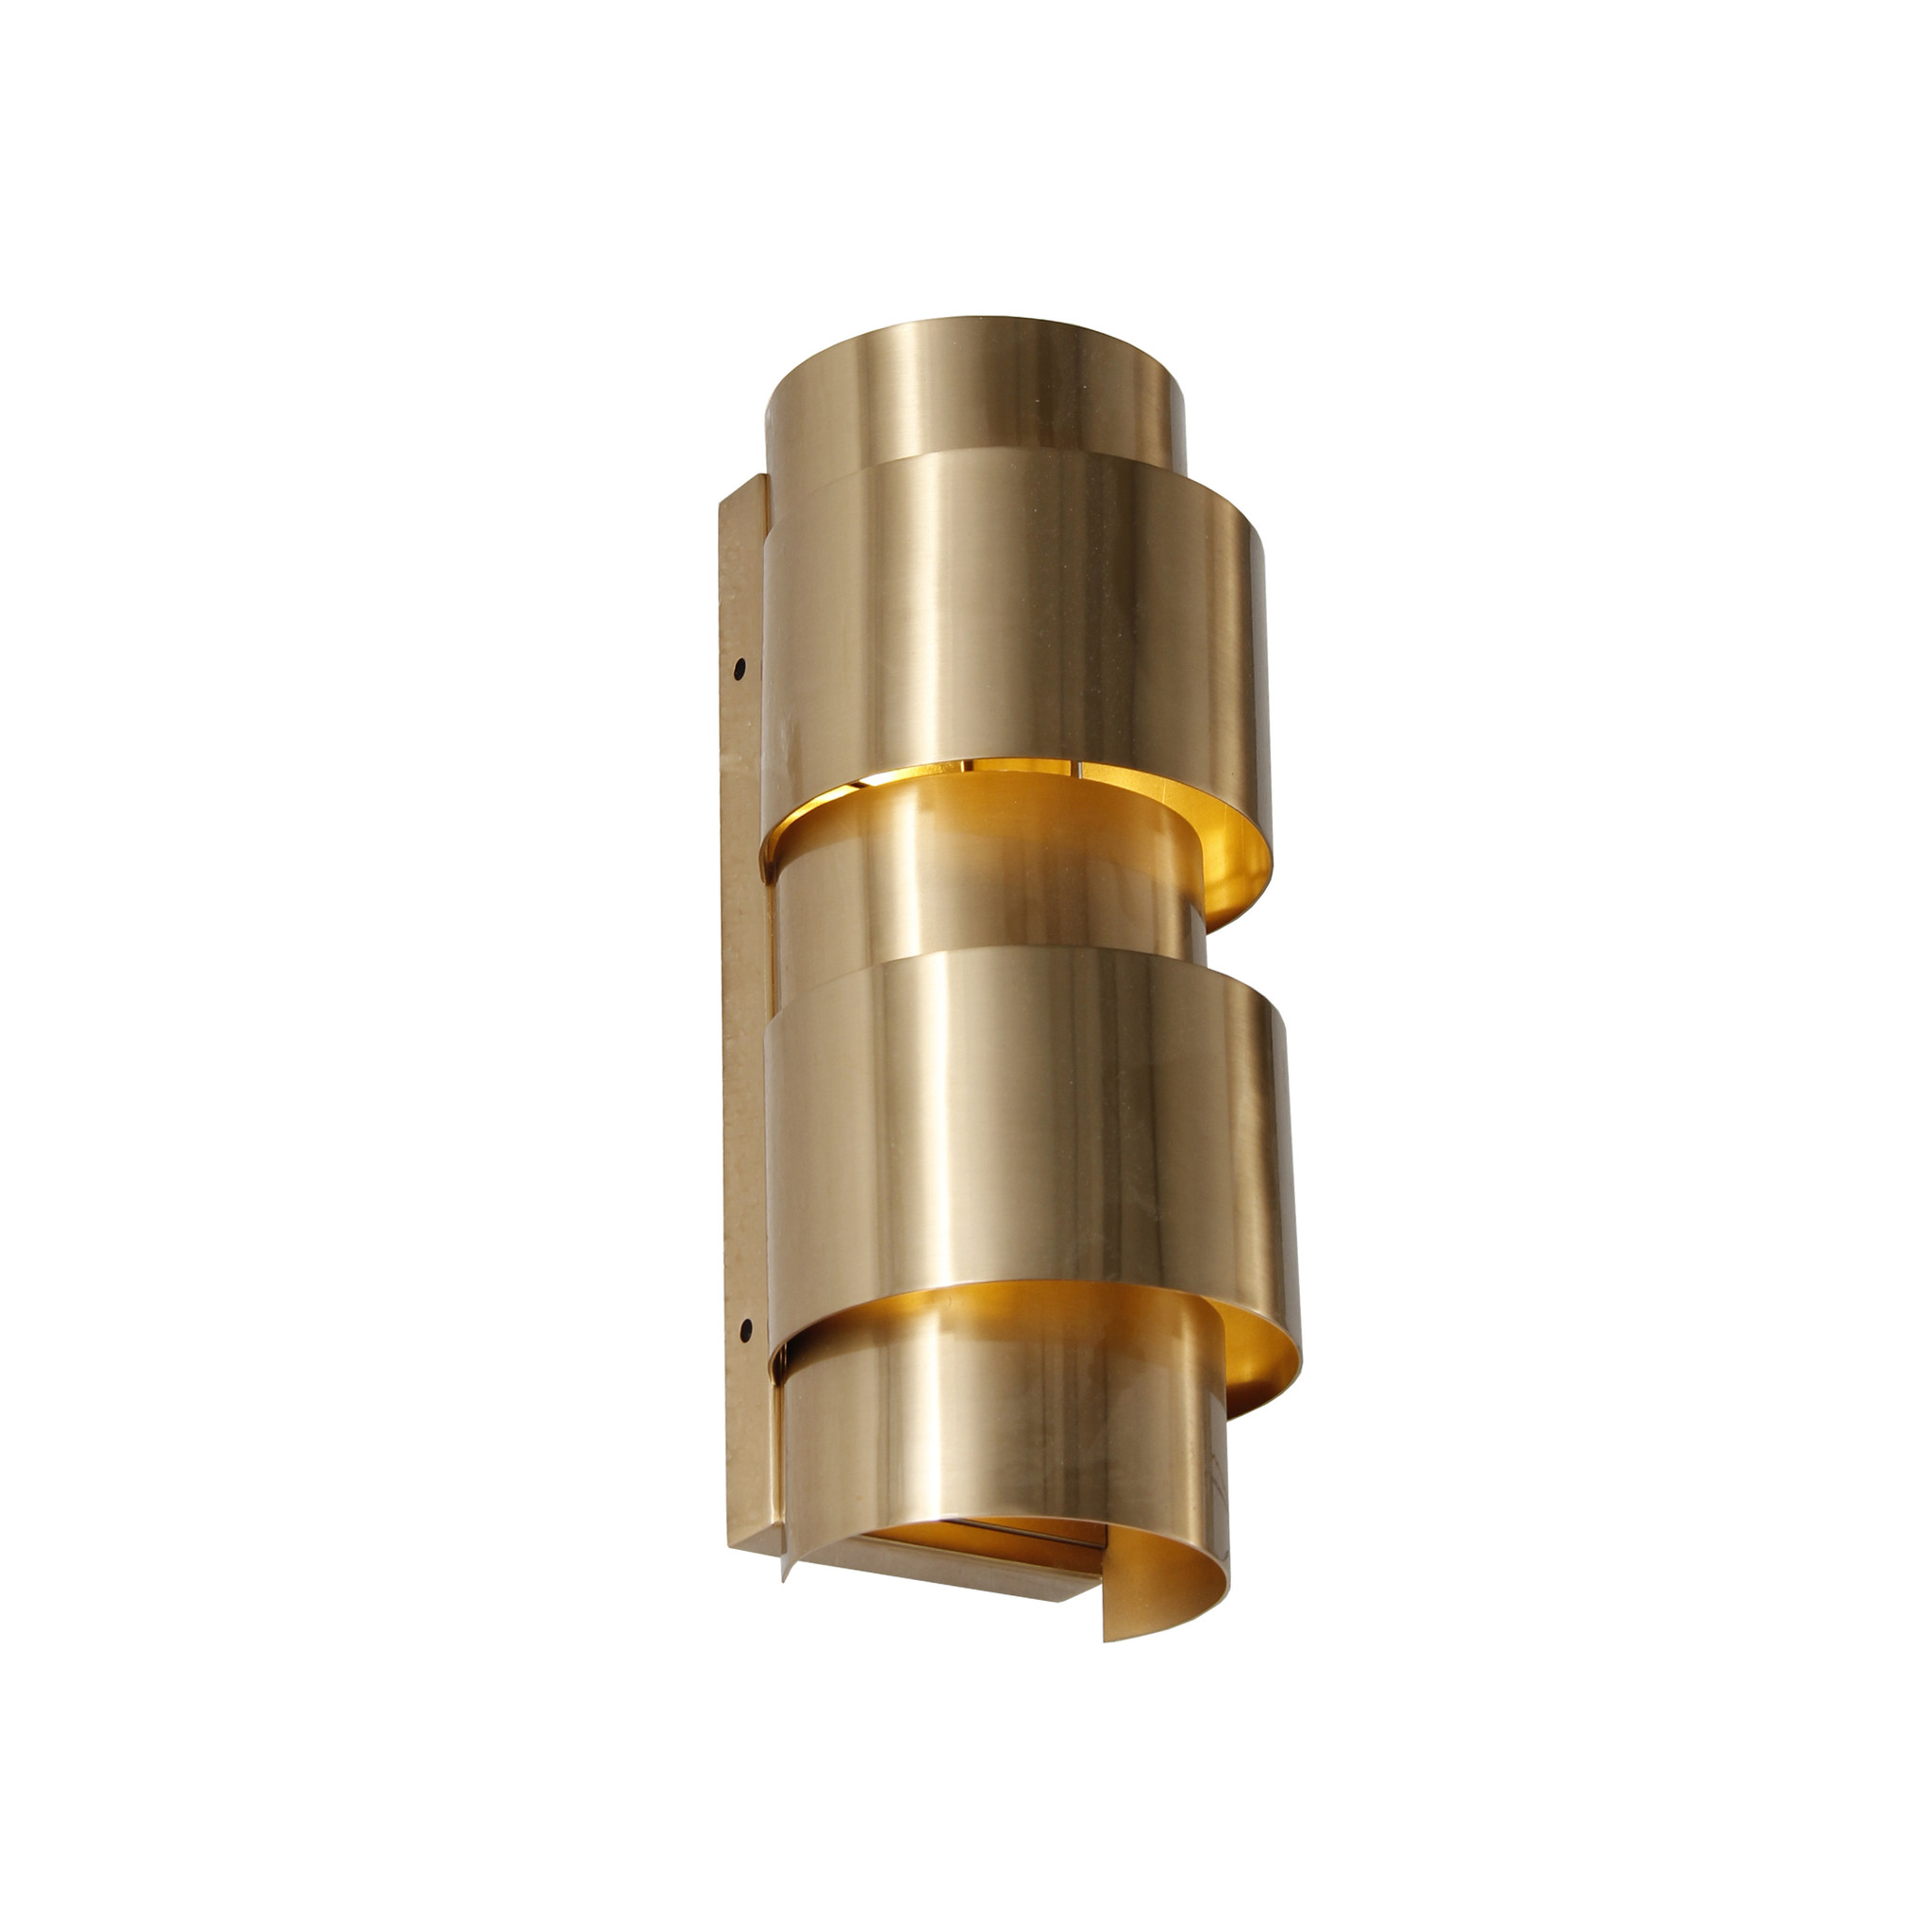 SAINT Wall light brushed brass-2